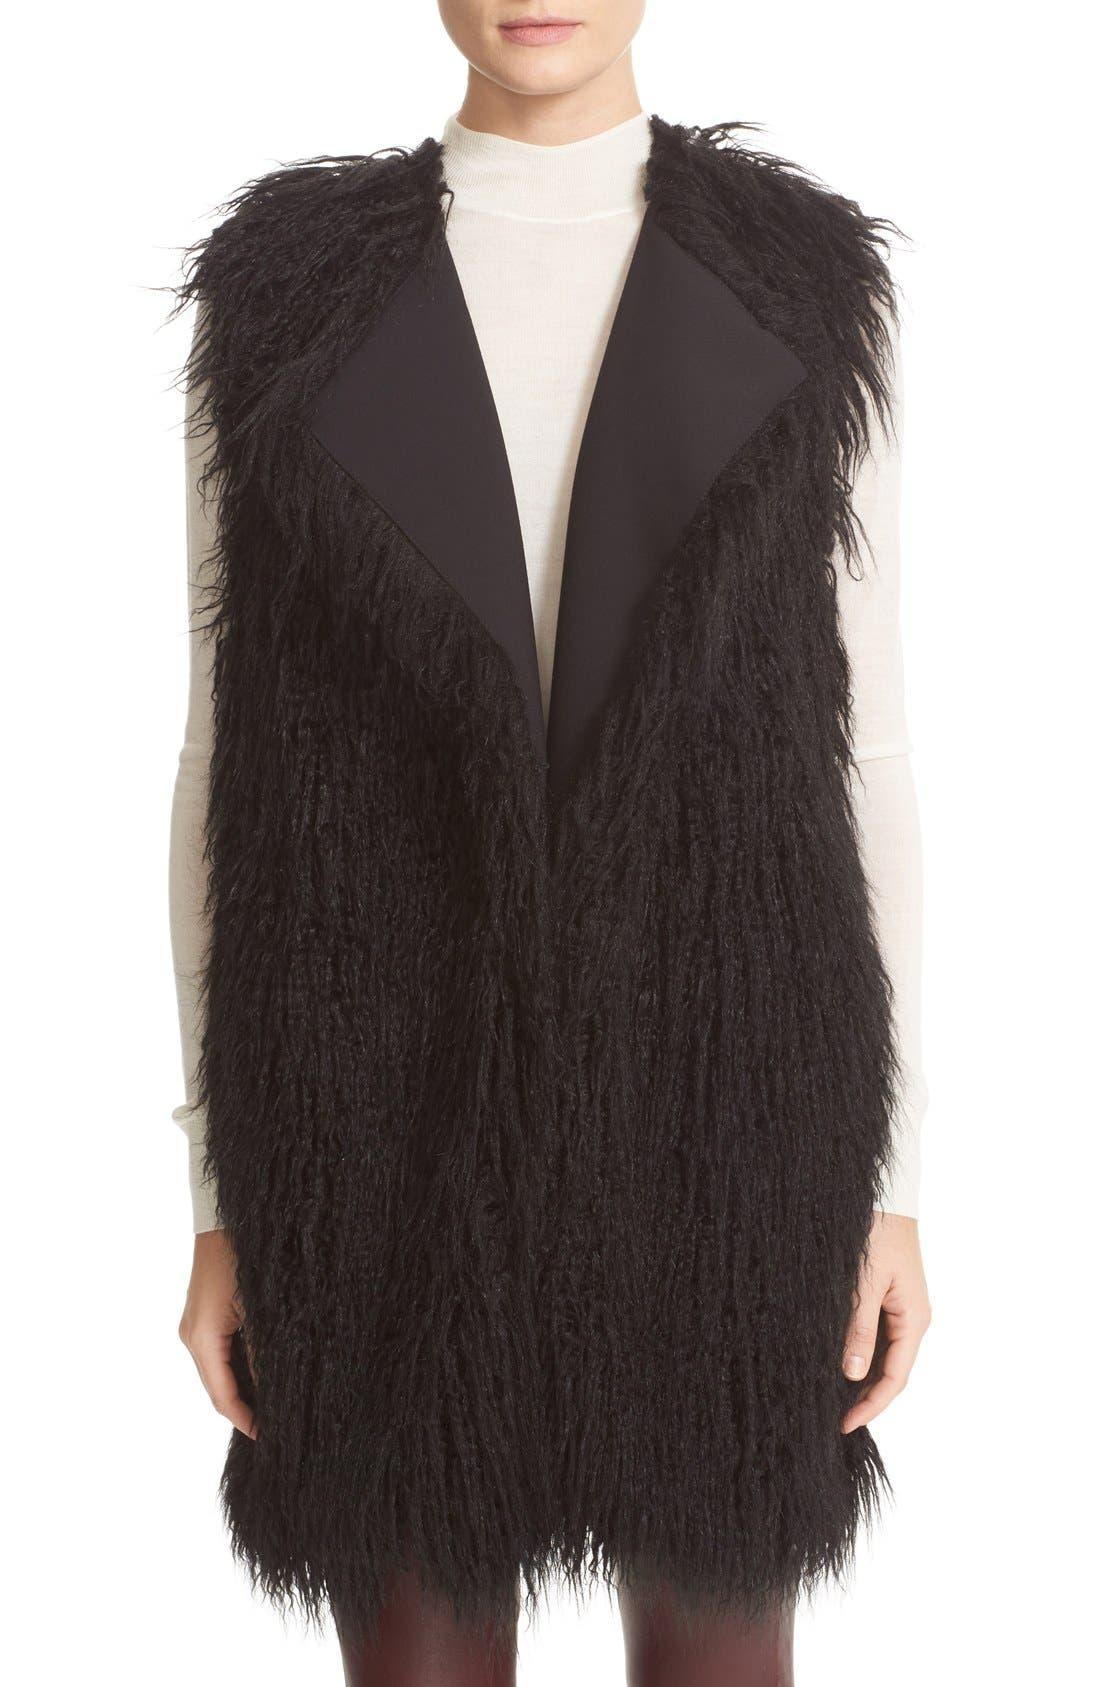 Nyma V Cody Shaggy Faux Fur Front Long Vest,                             Main thumbnail 1, color,                             001